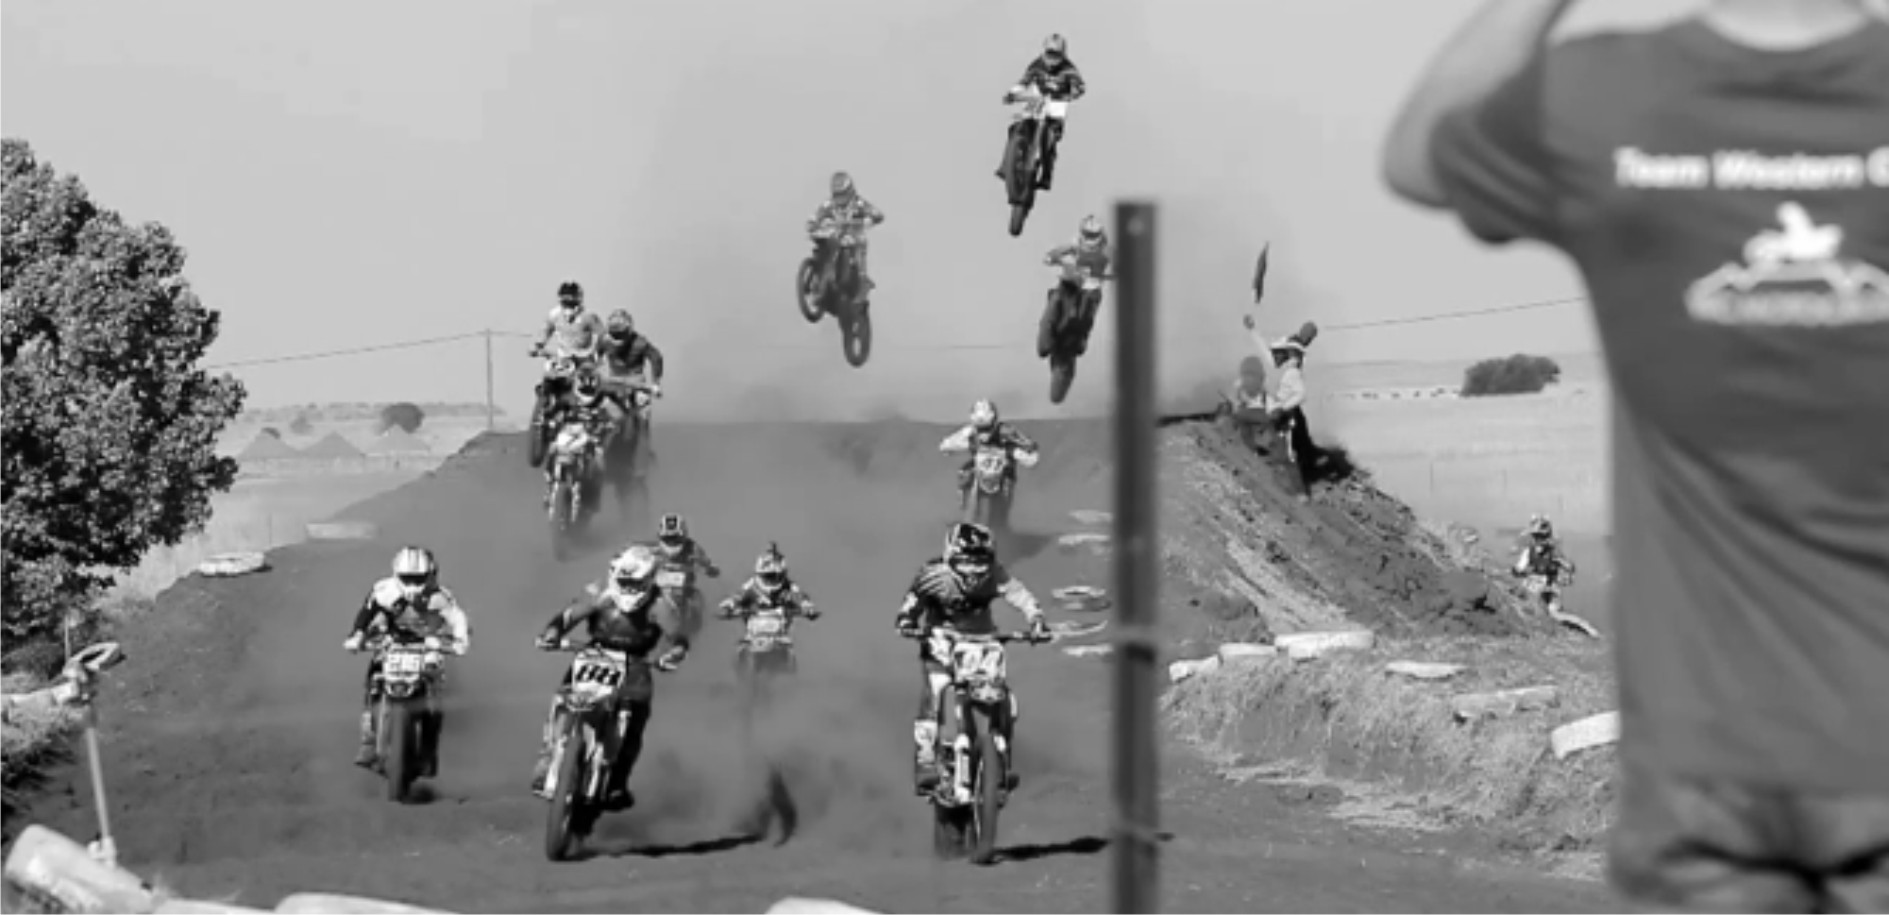 North vs South motocross video